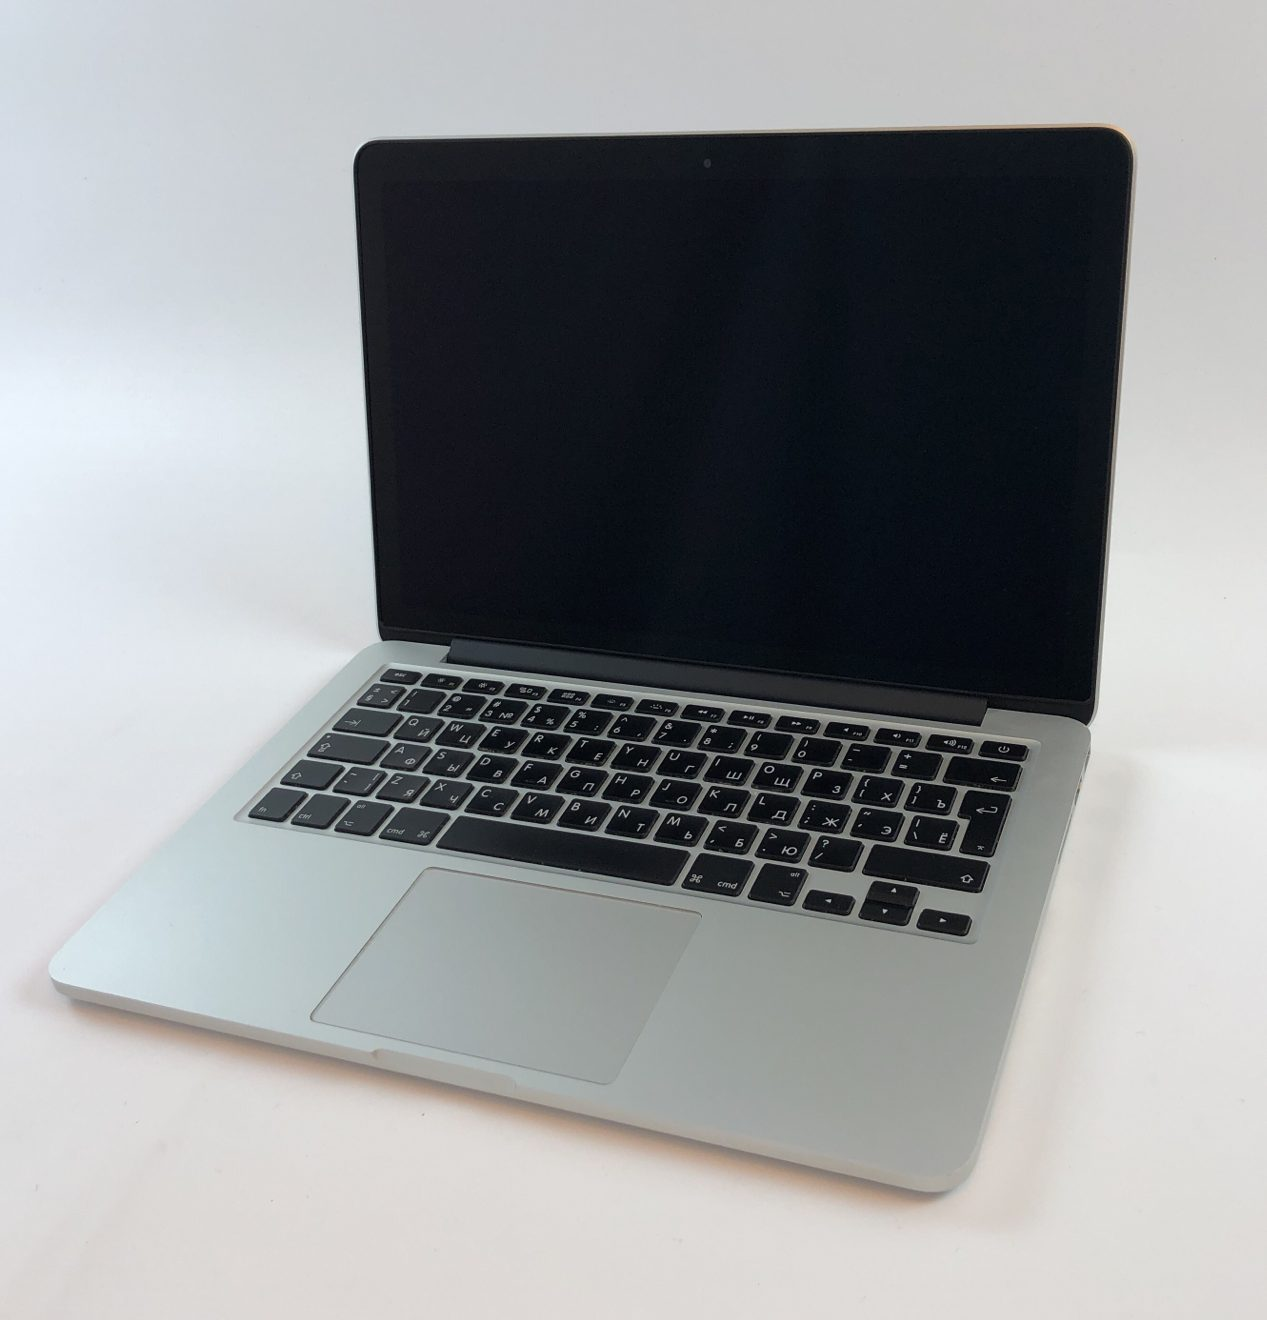 "MacBook Pro Retina 13"" Early 2015 (Intel Core i7 3.1 GHz 16 GB RAM 256 GB SSD), Intel Core i7 3.1 GHz, 16 GB RAM, 256 GB SSD, Kuva 1"